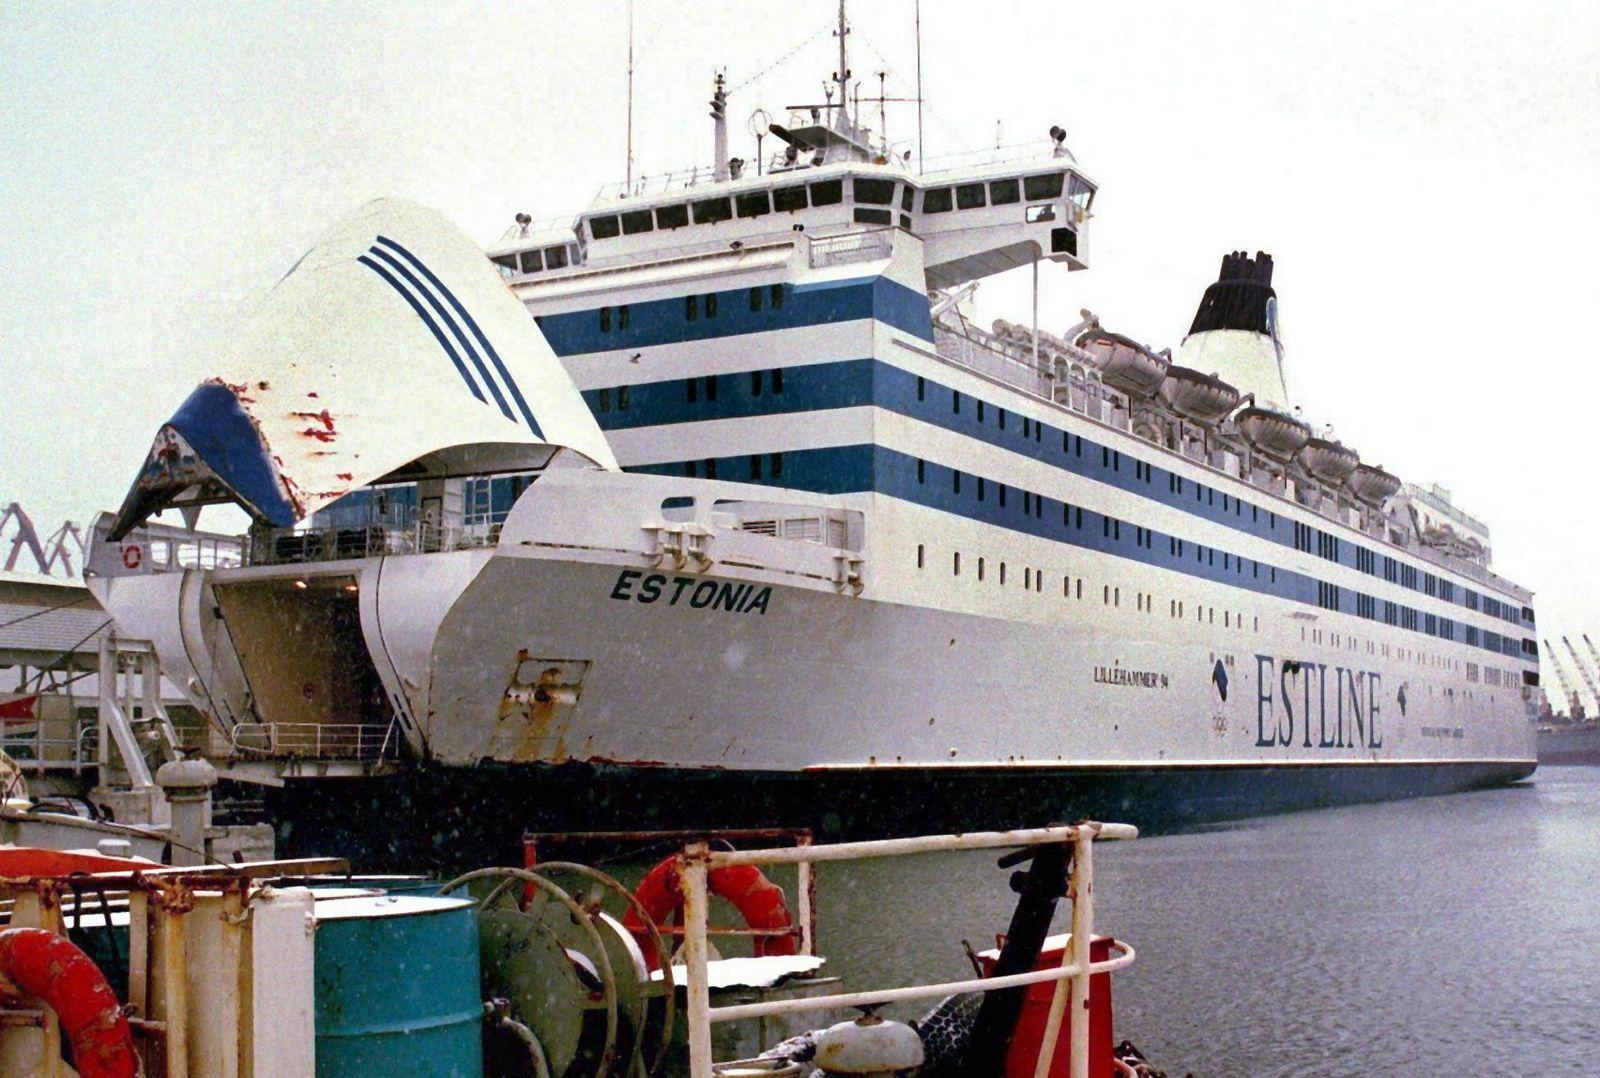 25 Jahre nach «Estonia»-Unglück